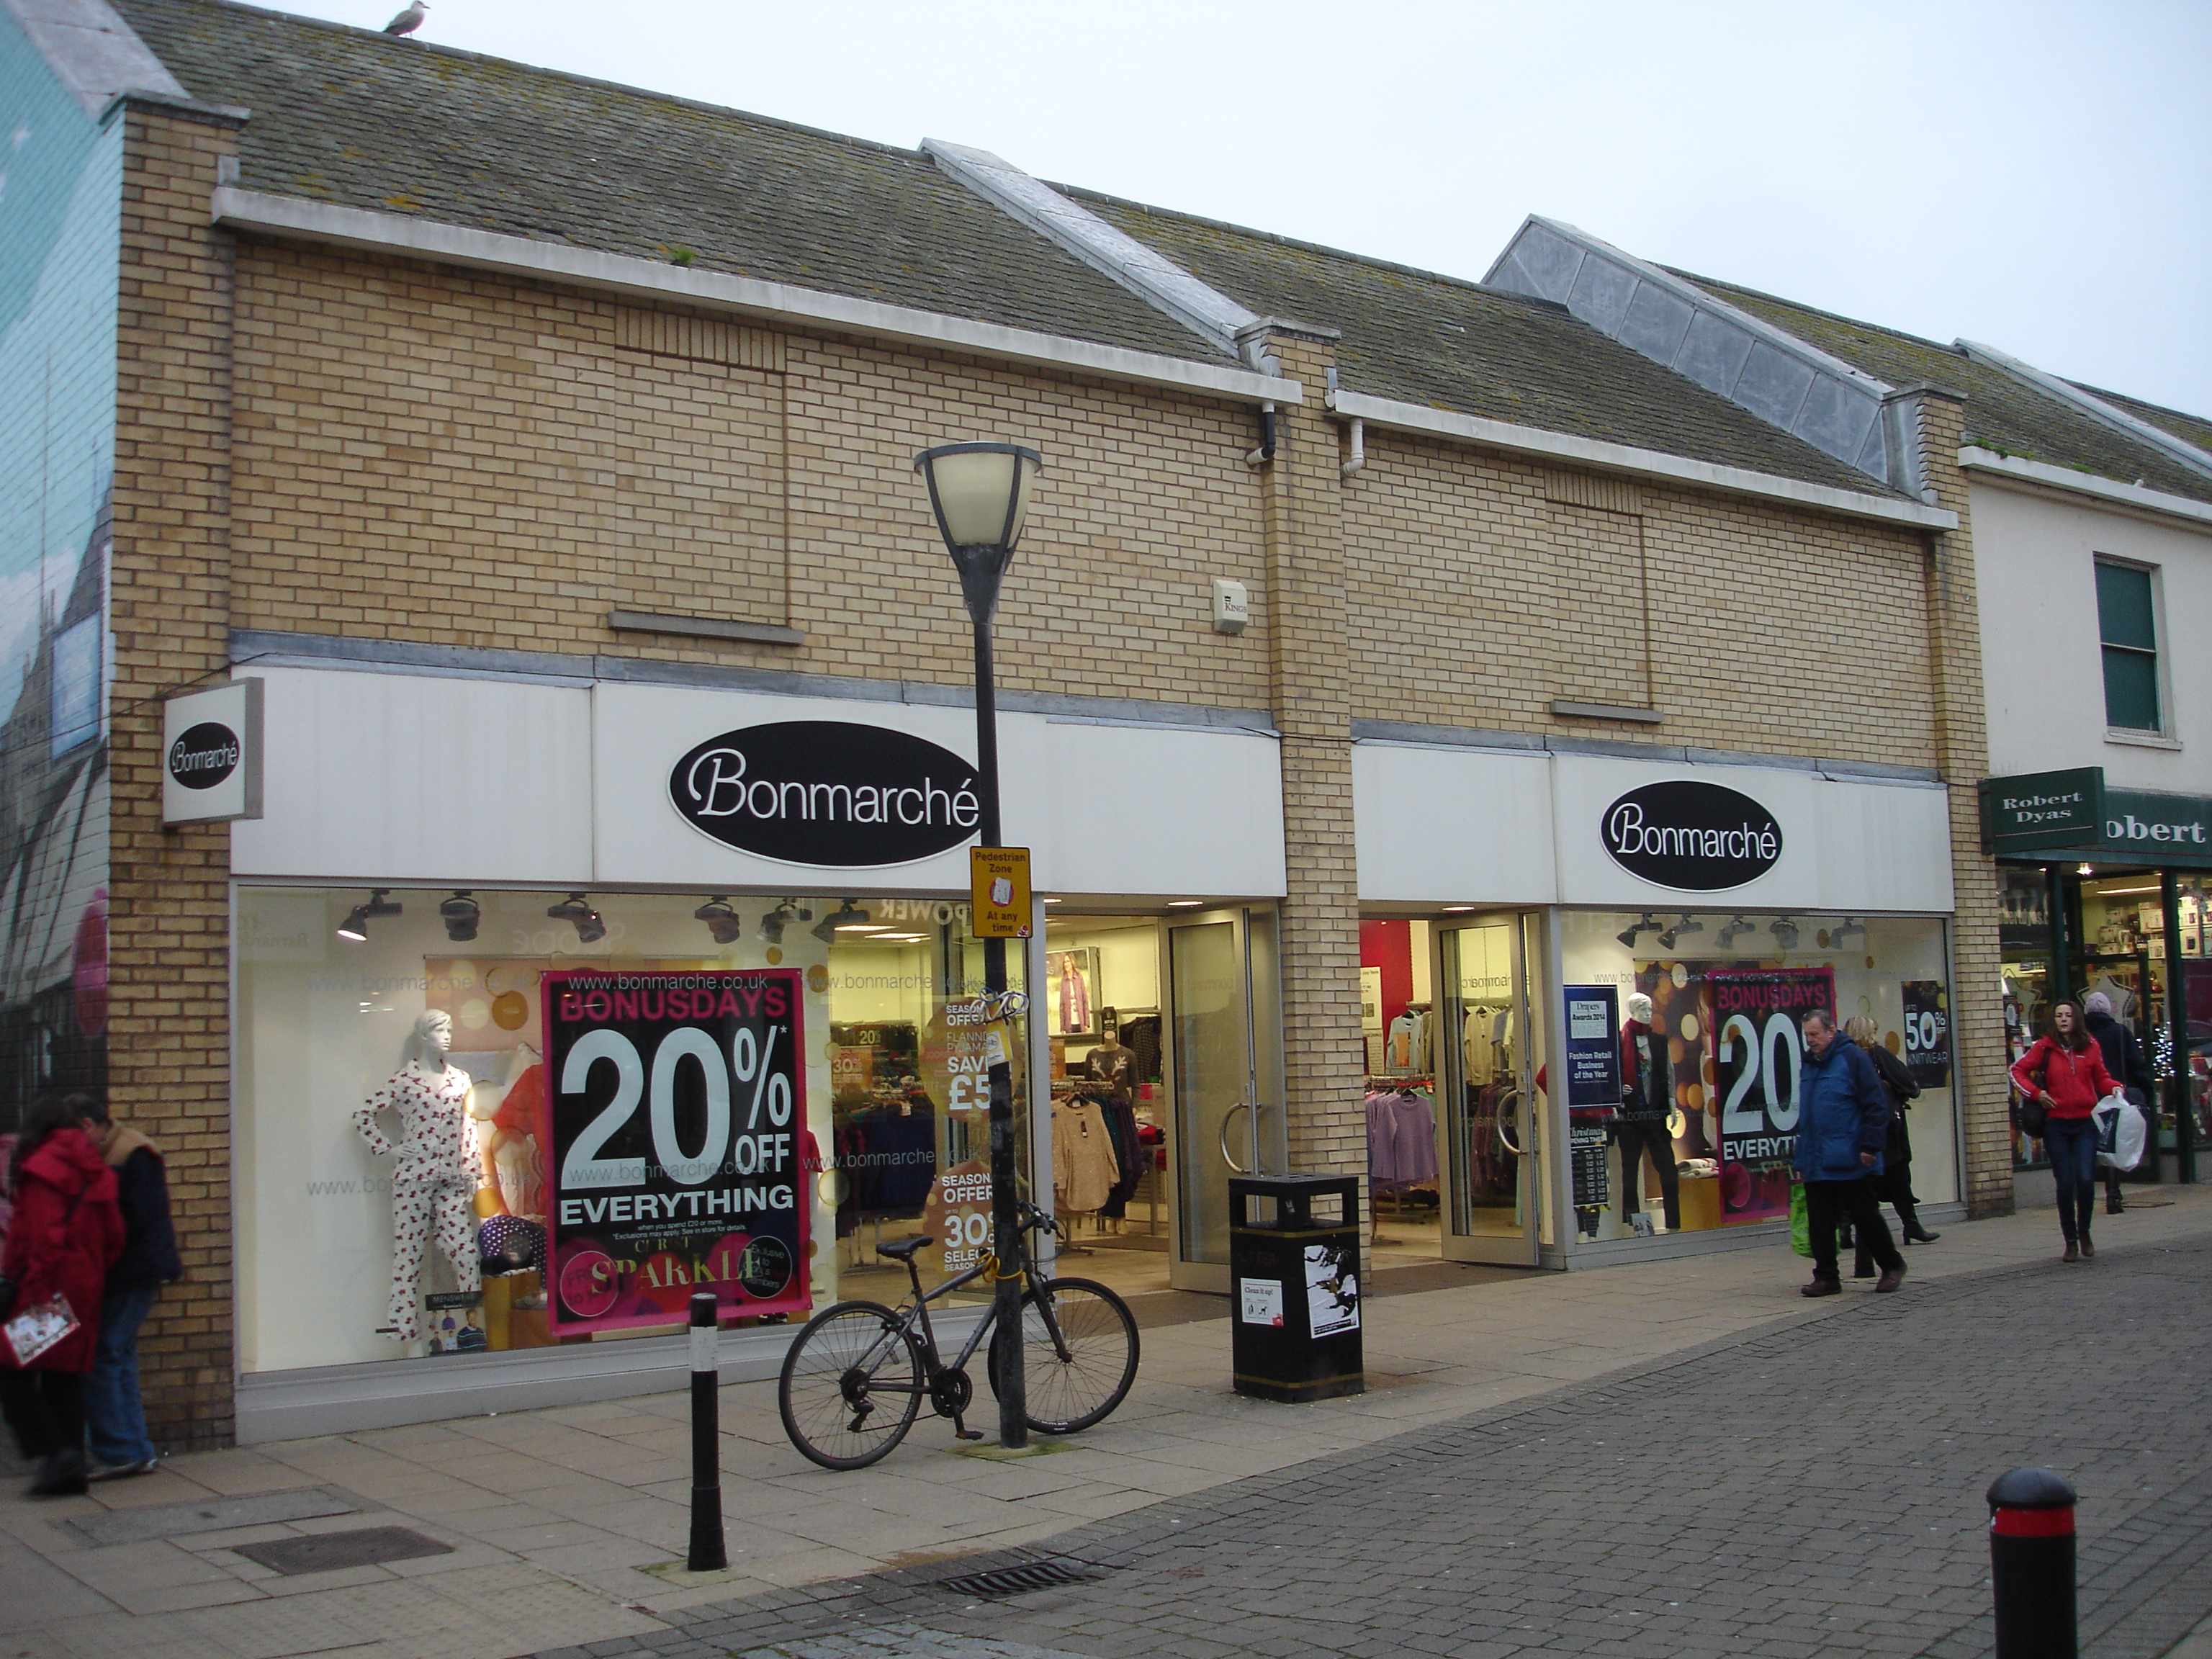 Commercial Property Advisors Bristol